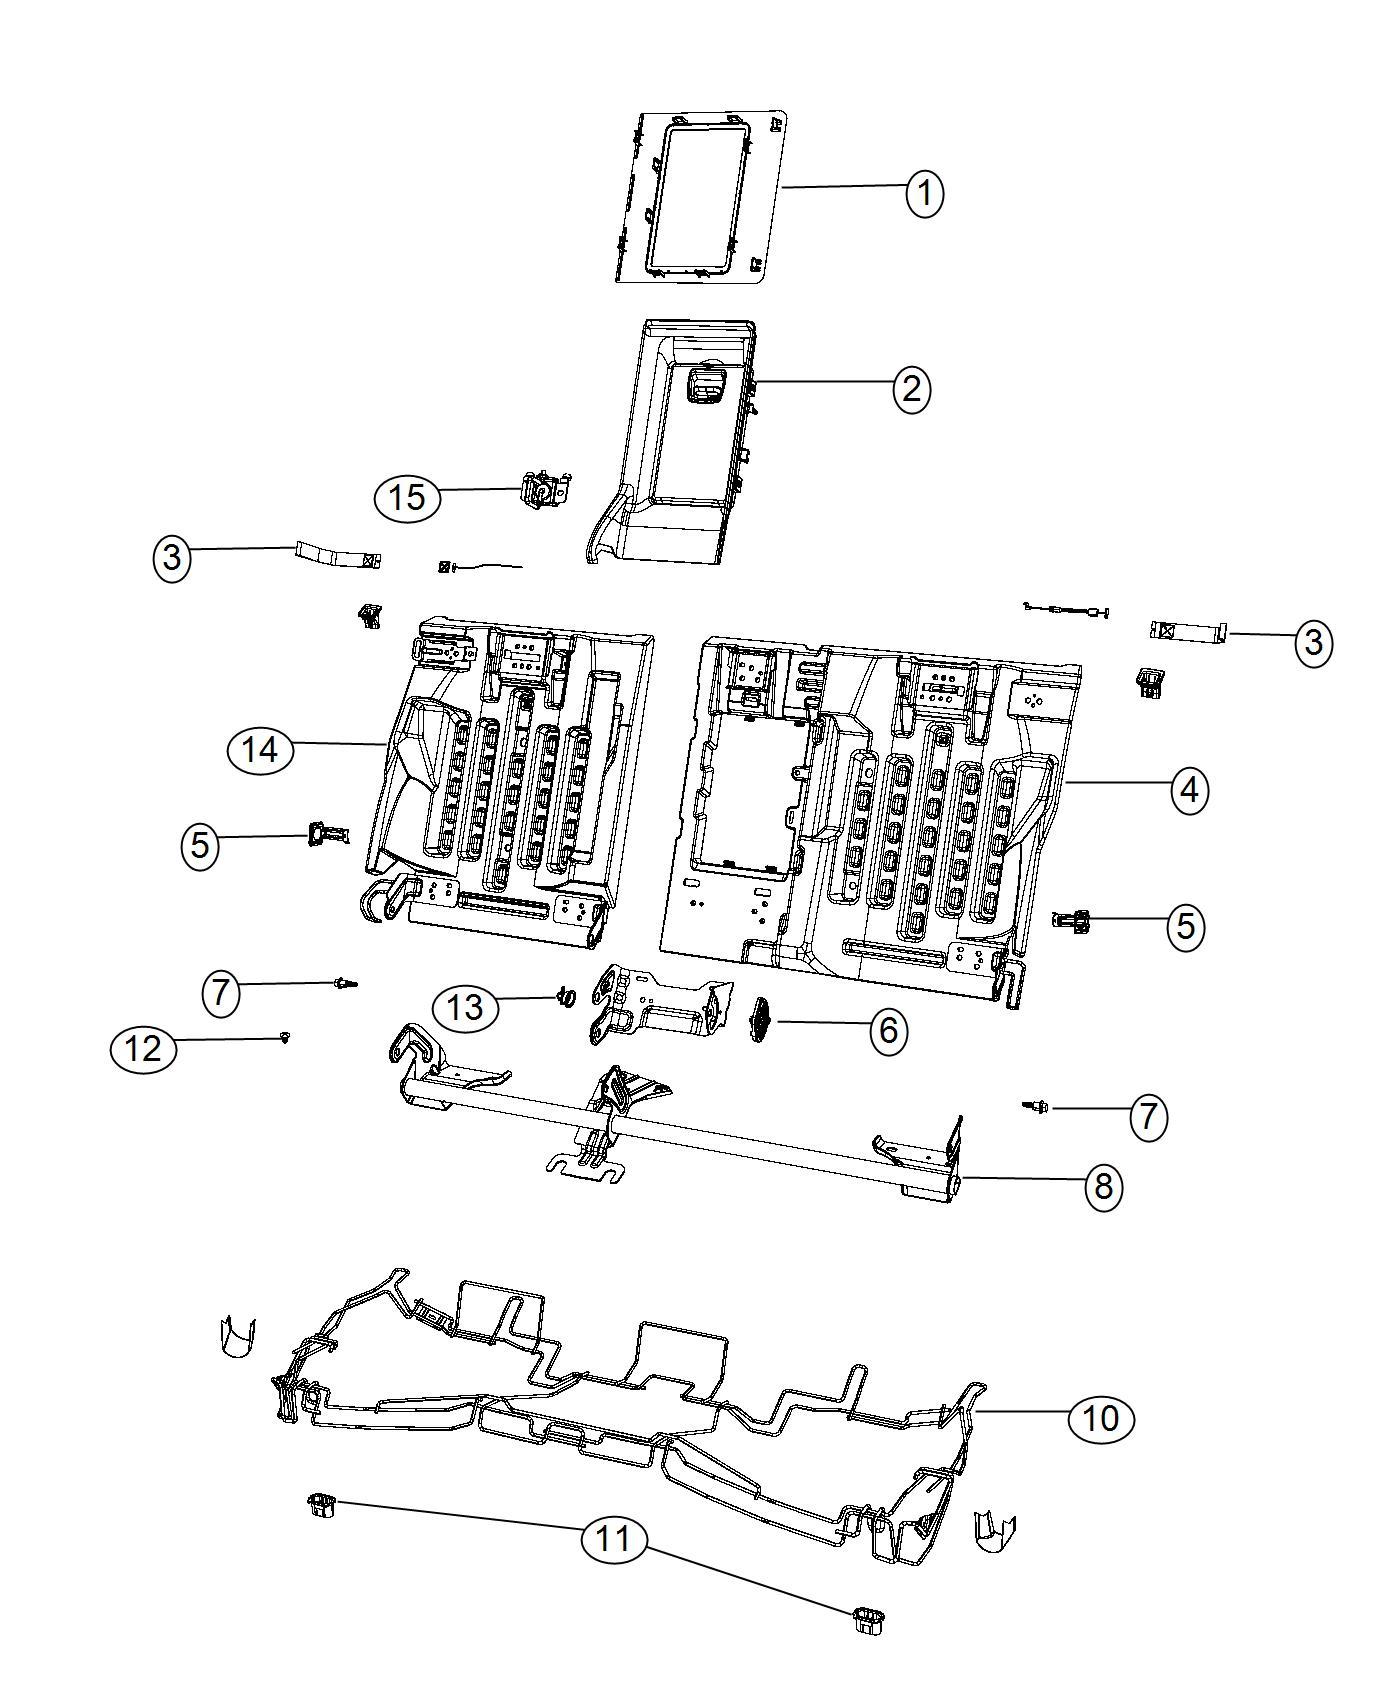 Chrysler 200 Housing Assembly Rear Seat Black Caramel